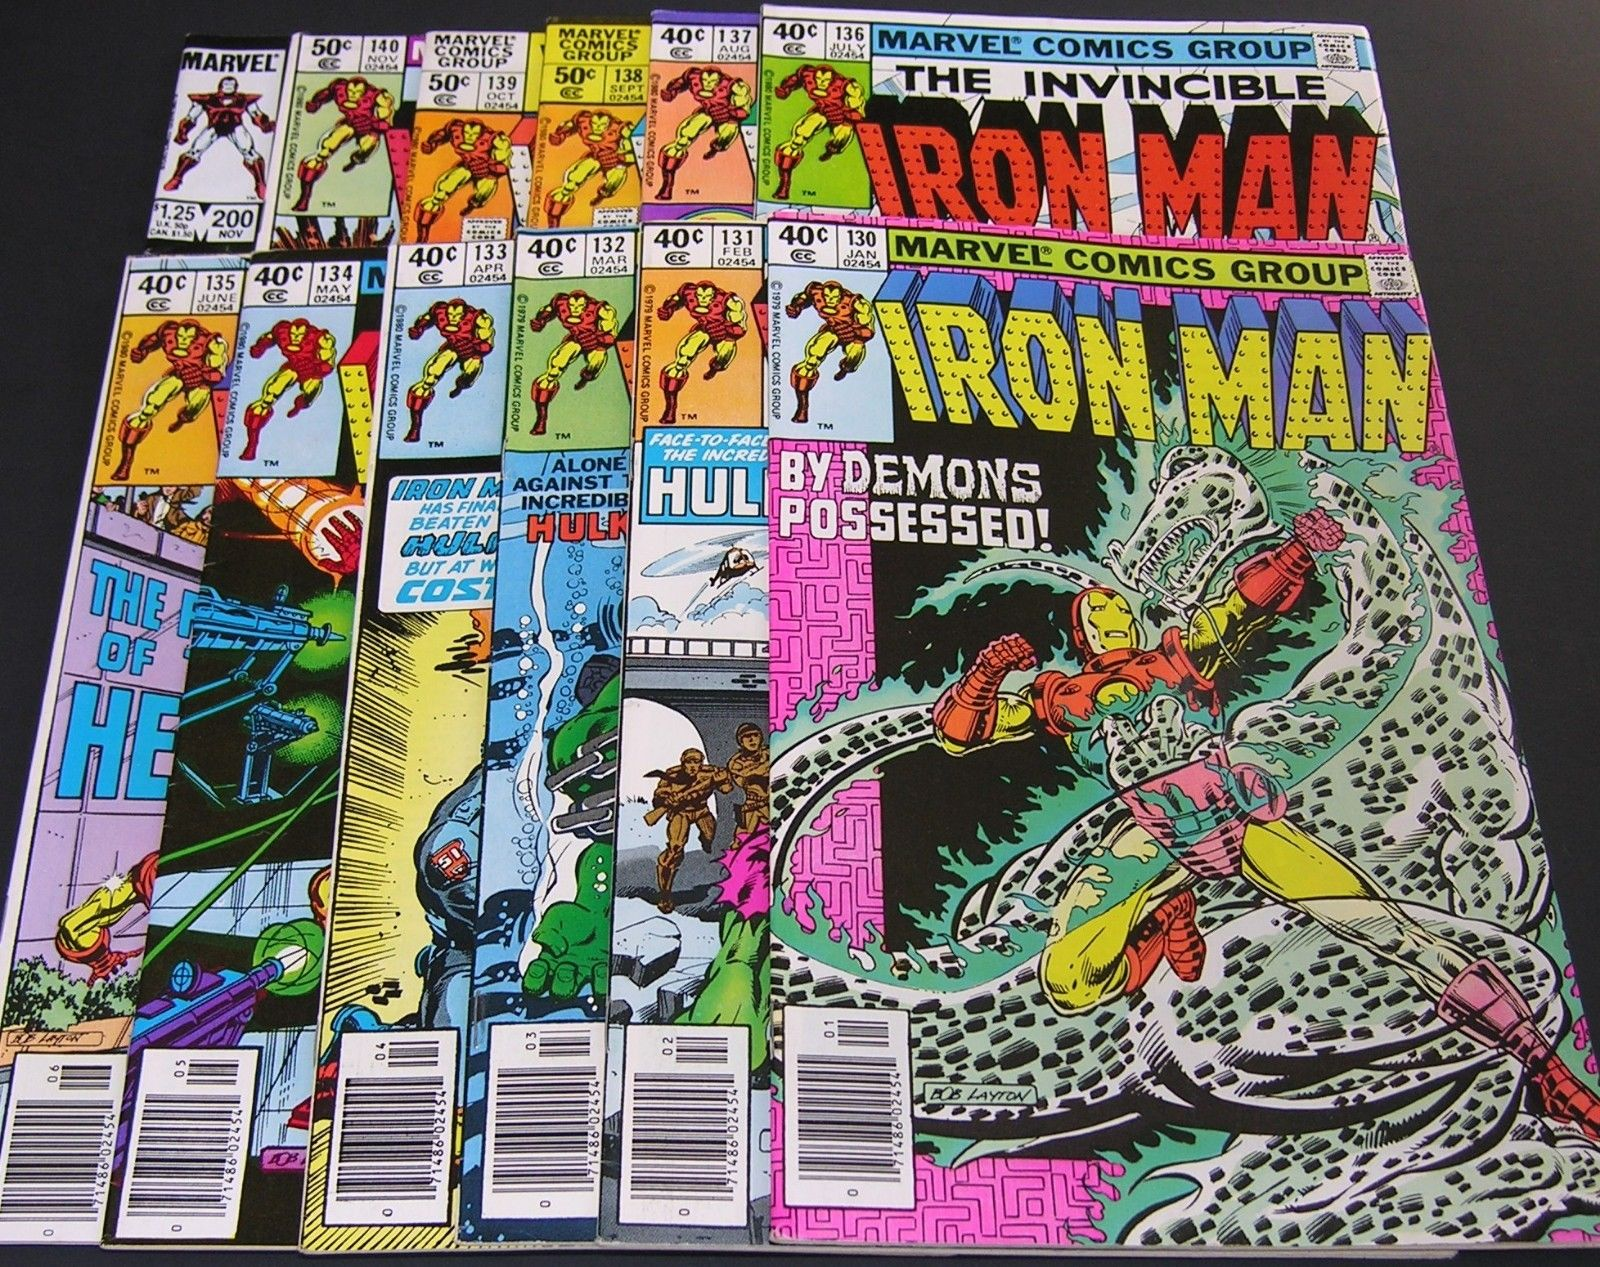 Iron Man 130,131,132,133,134,135,136,137,138,139,140,200 (Marvel) Ant-Man, Hulk